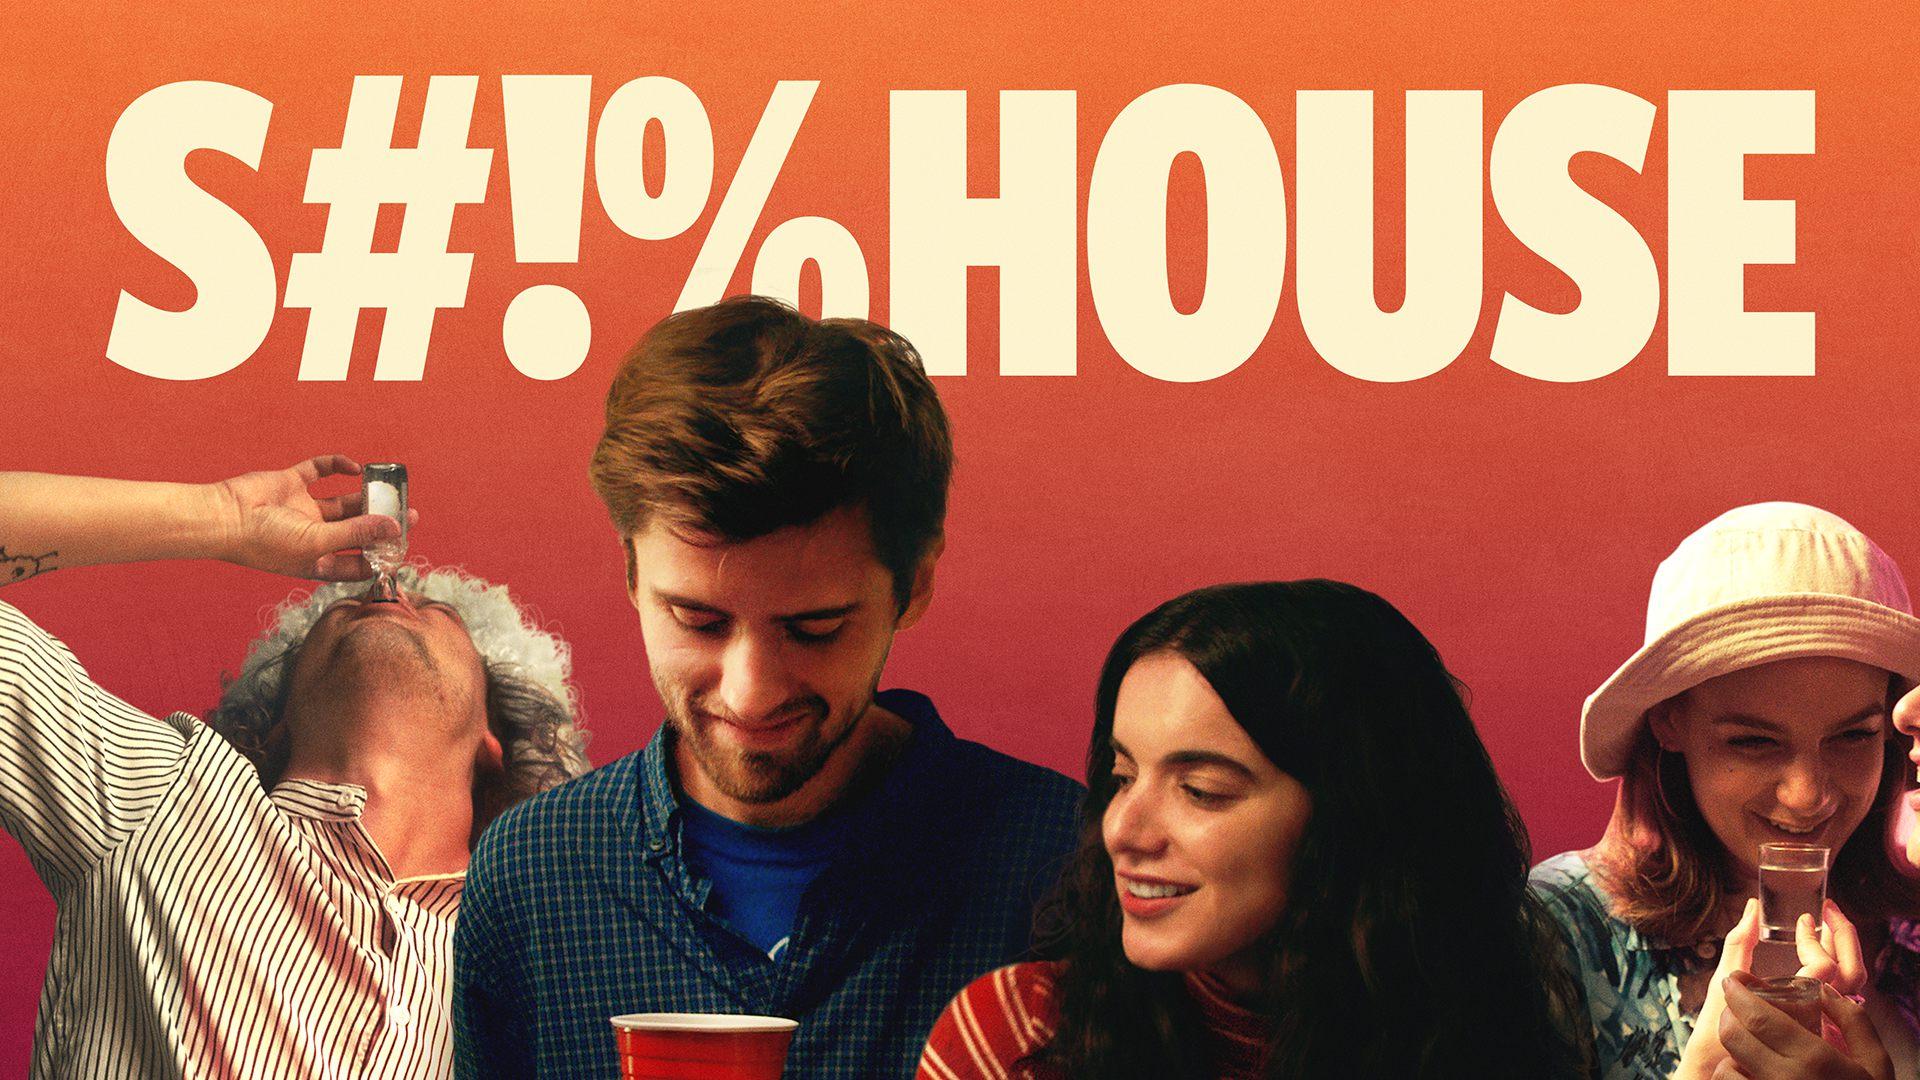 Shithouse